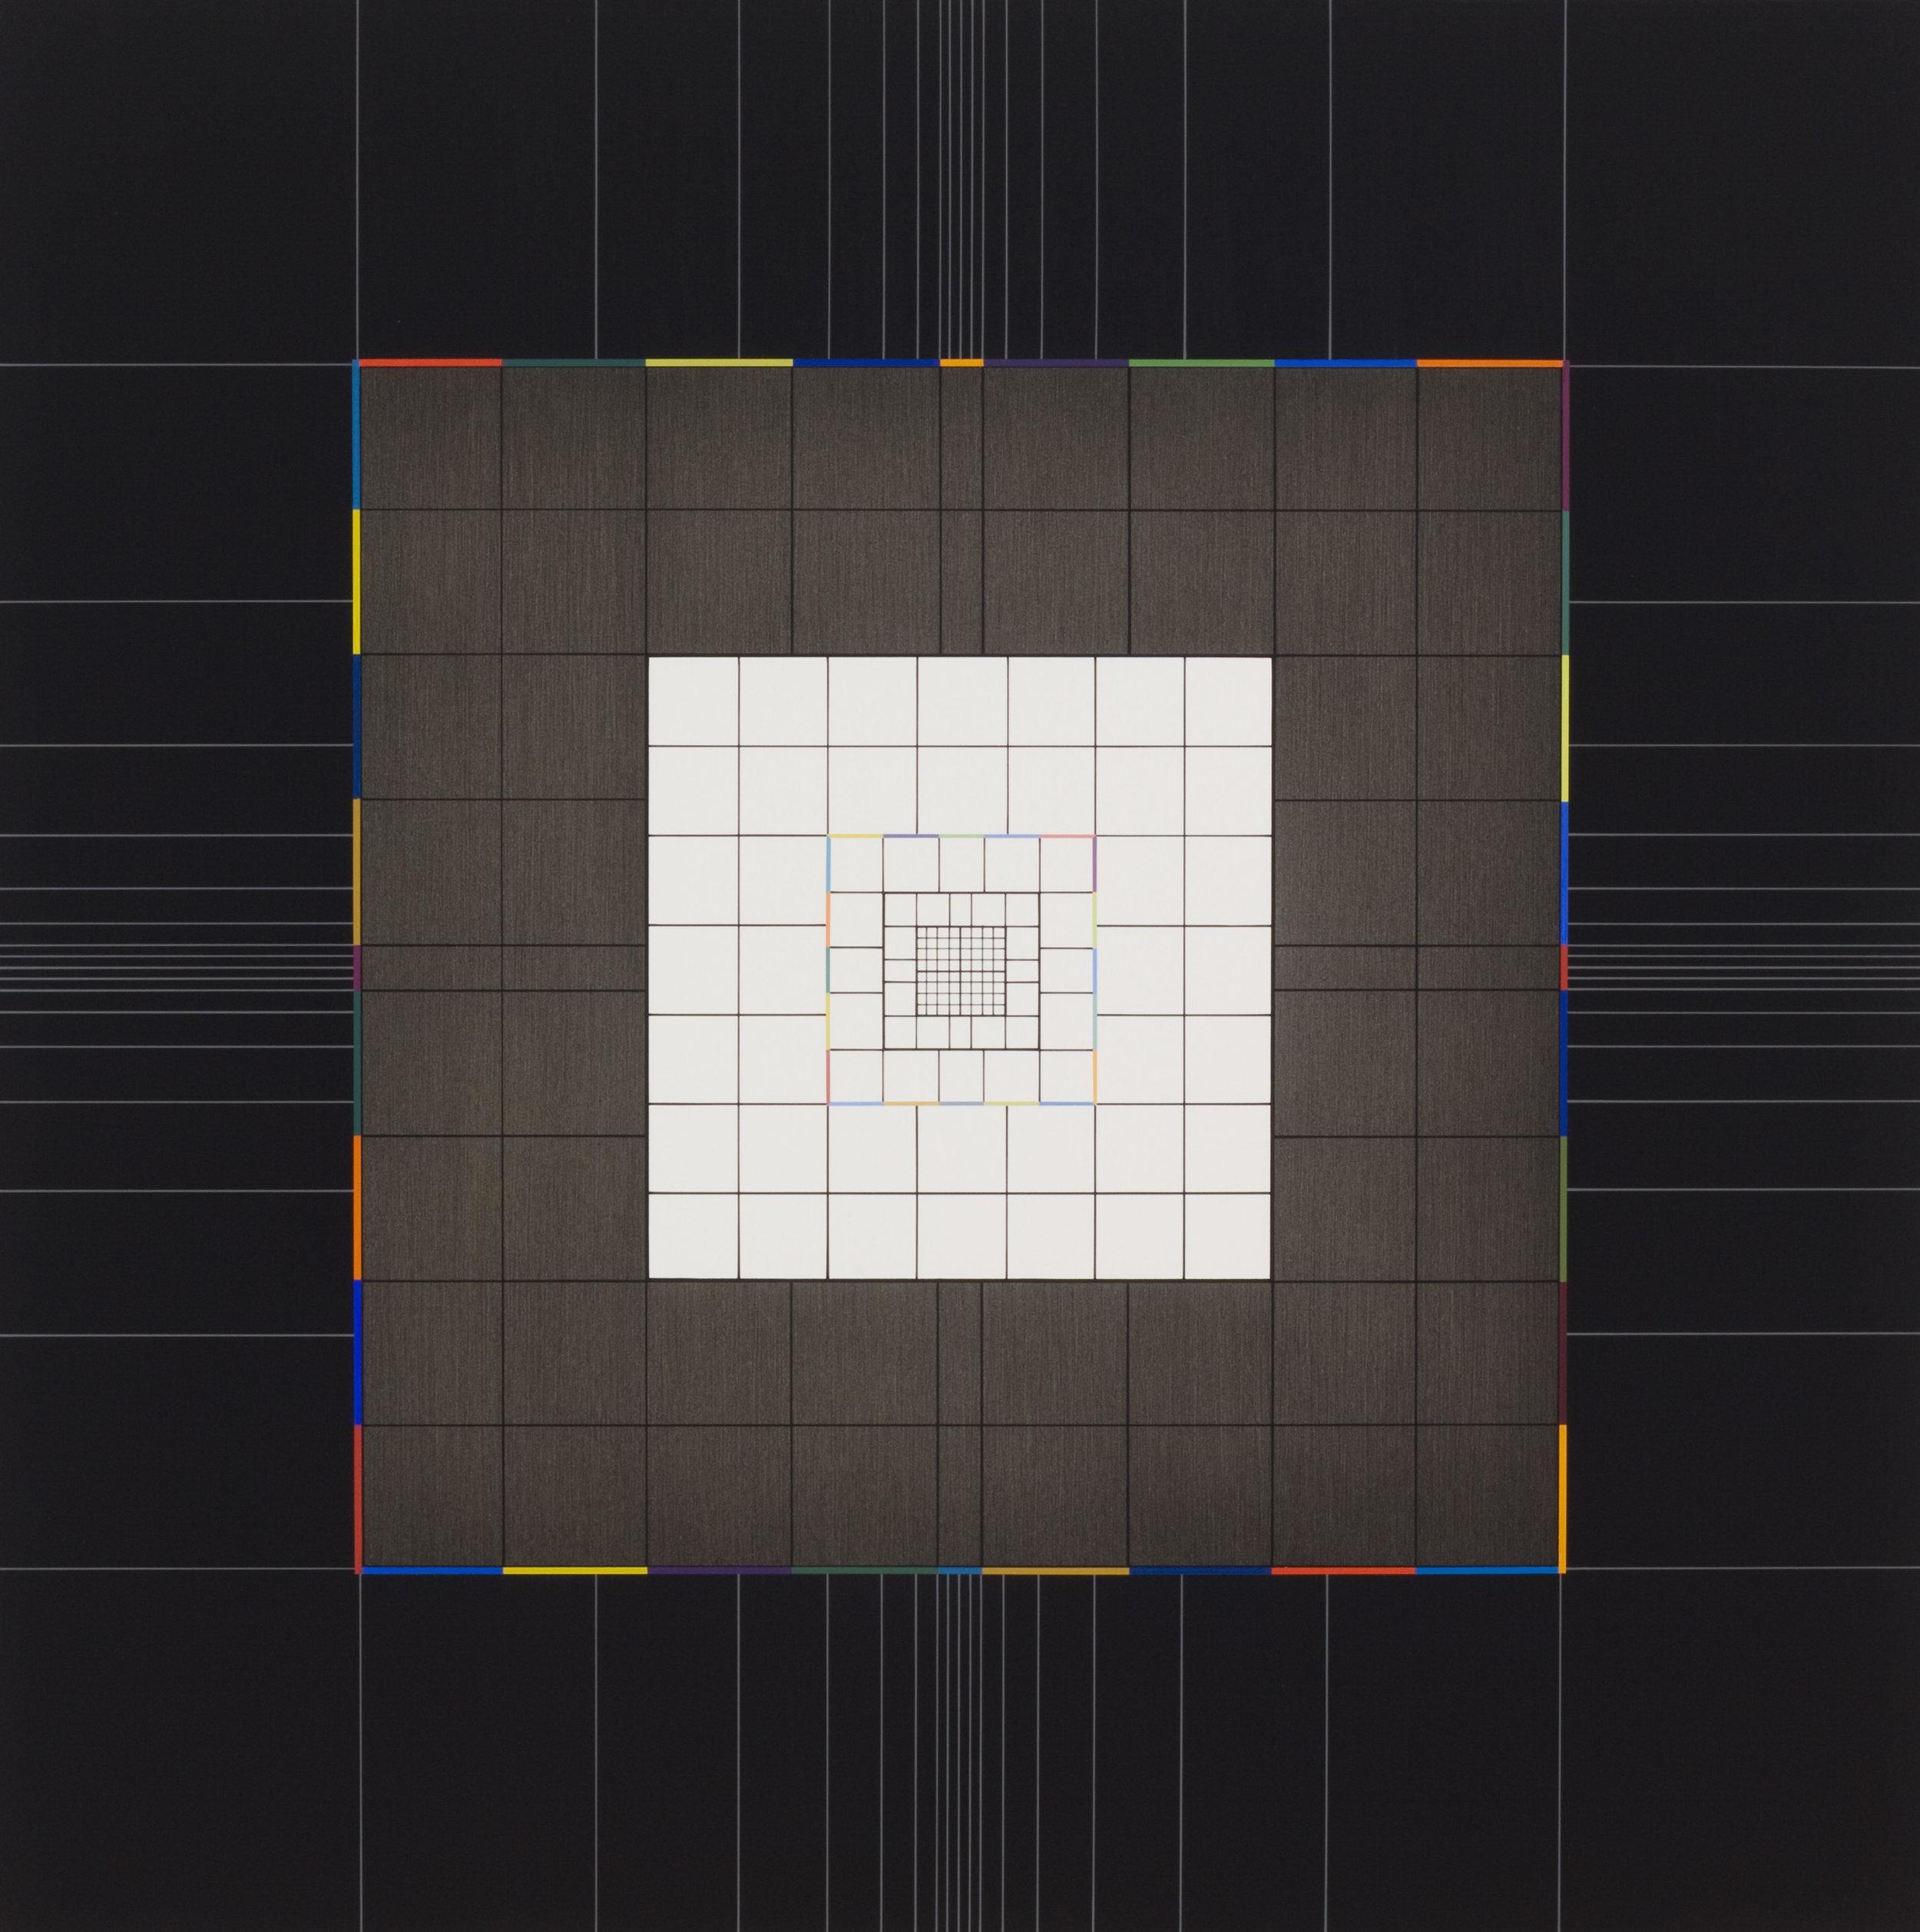 Yantra-ipsum-creator(3)2013.Jan, acrylic on canvas, 29 1/2 x 29 1/2 in. [75x75cm]